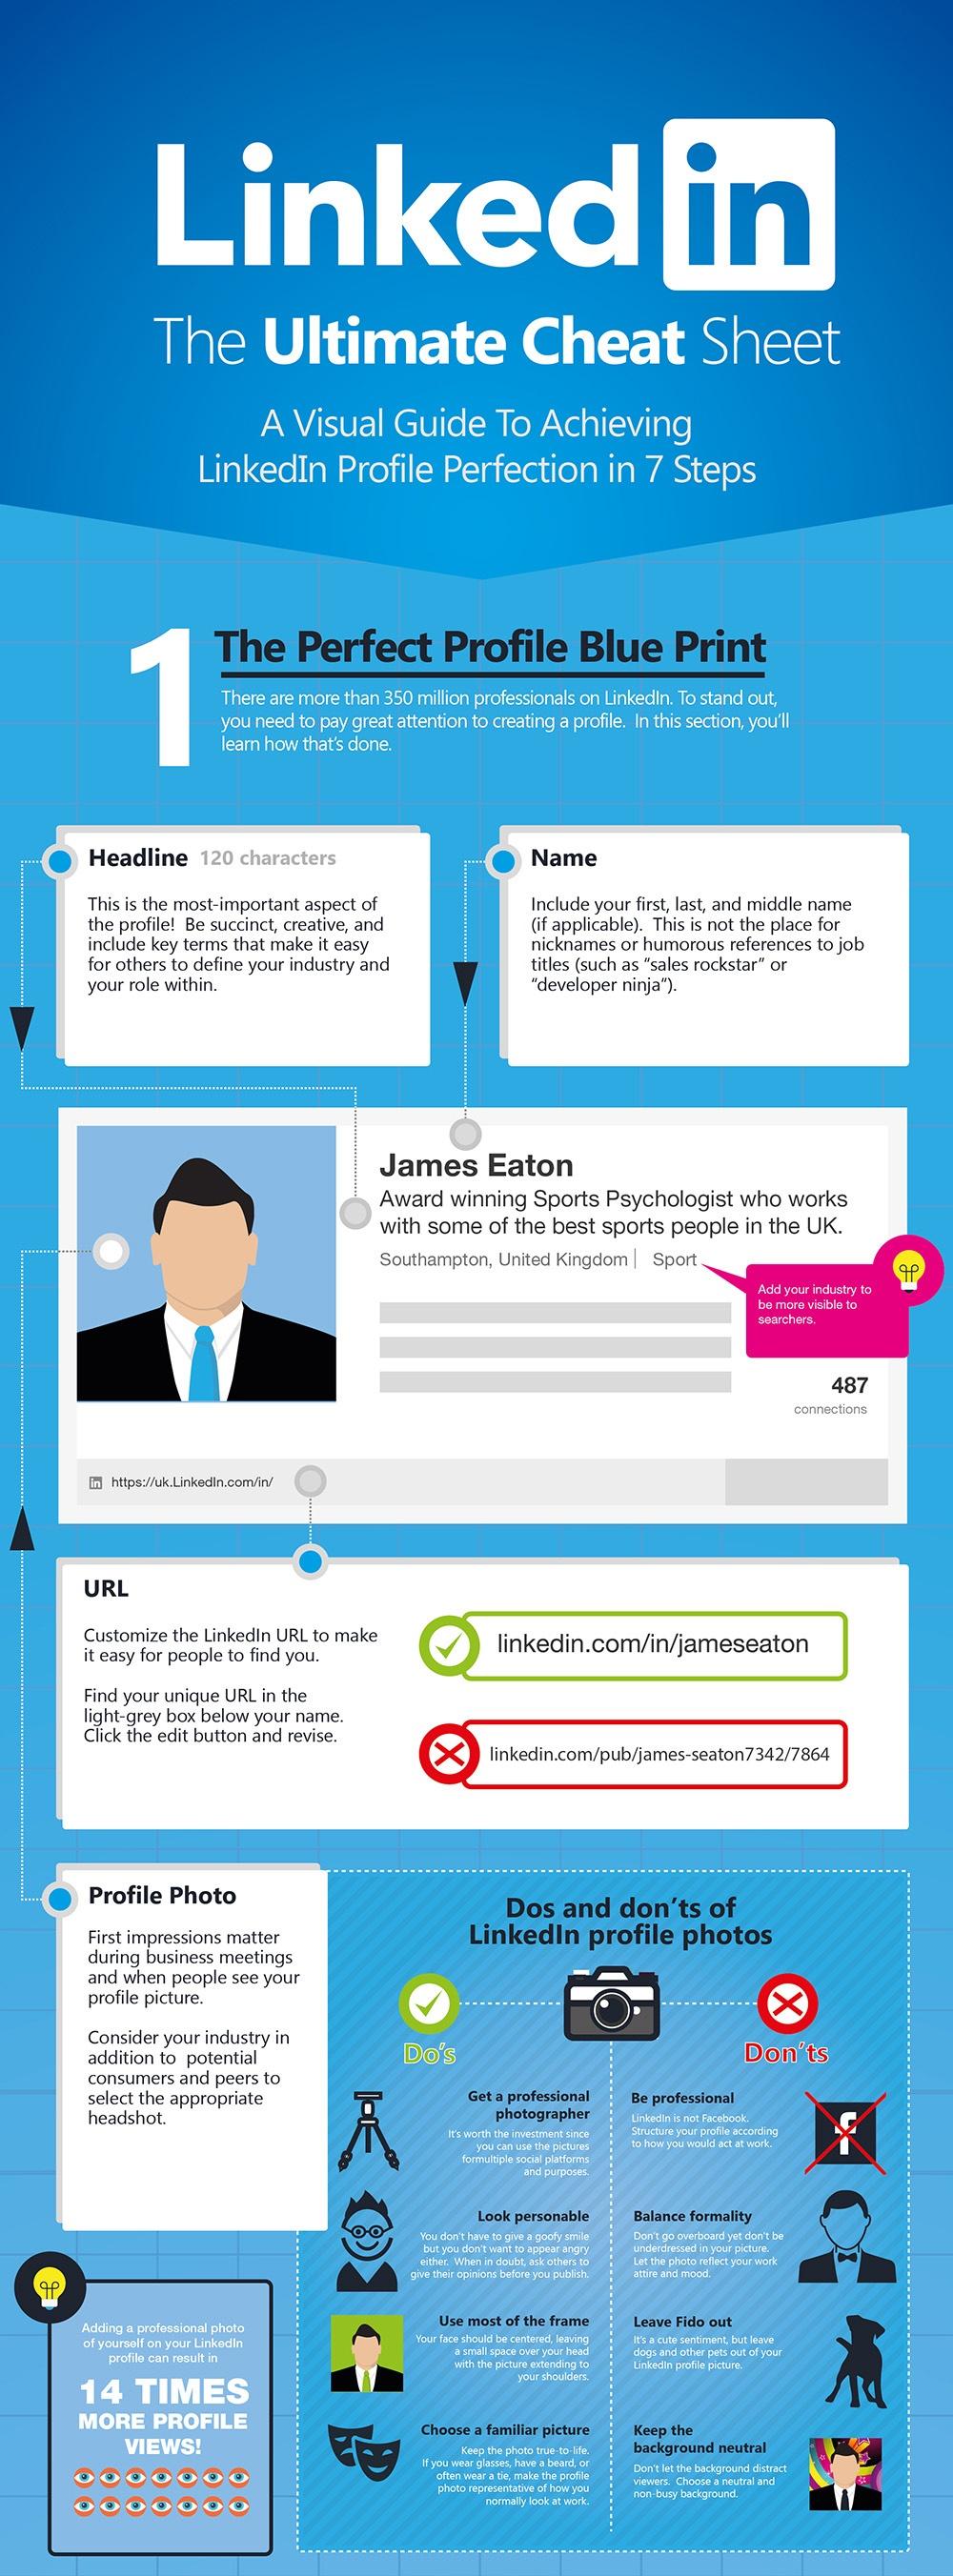 4 Ways to Optimize Your LinkedIn Profile